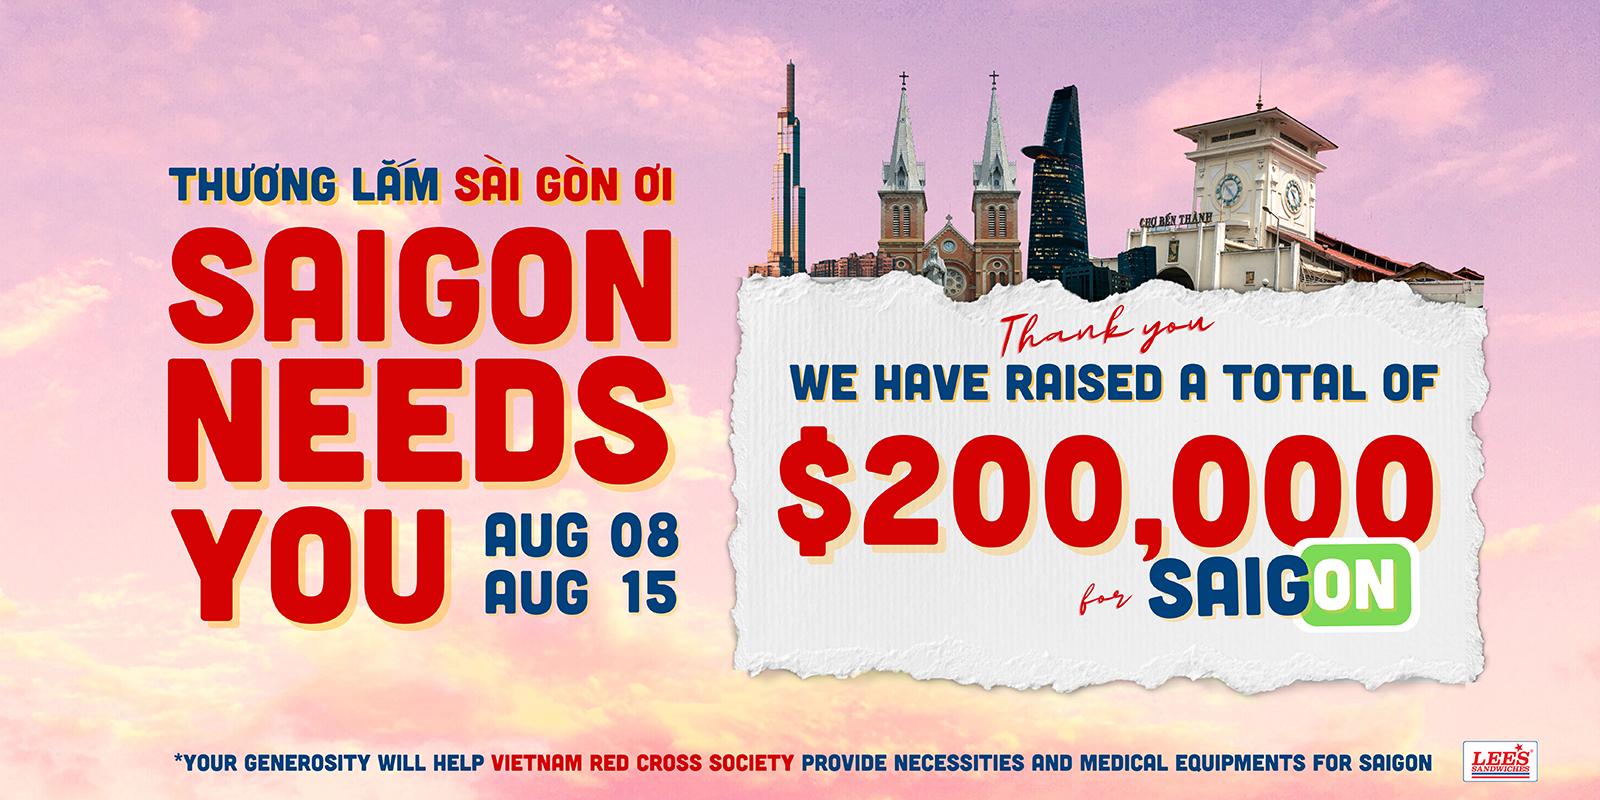 Saigon Needs You